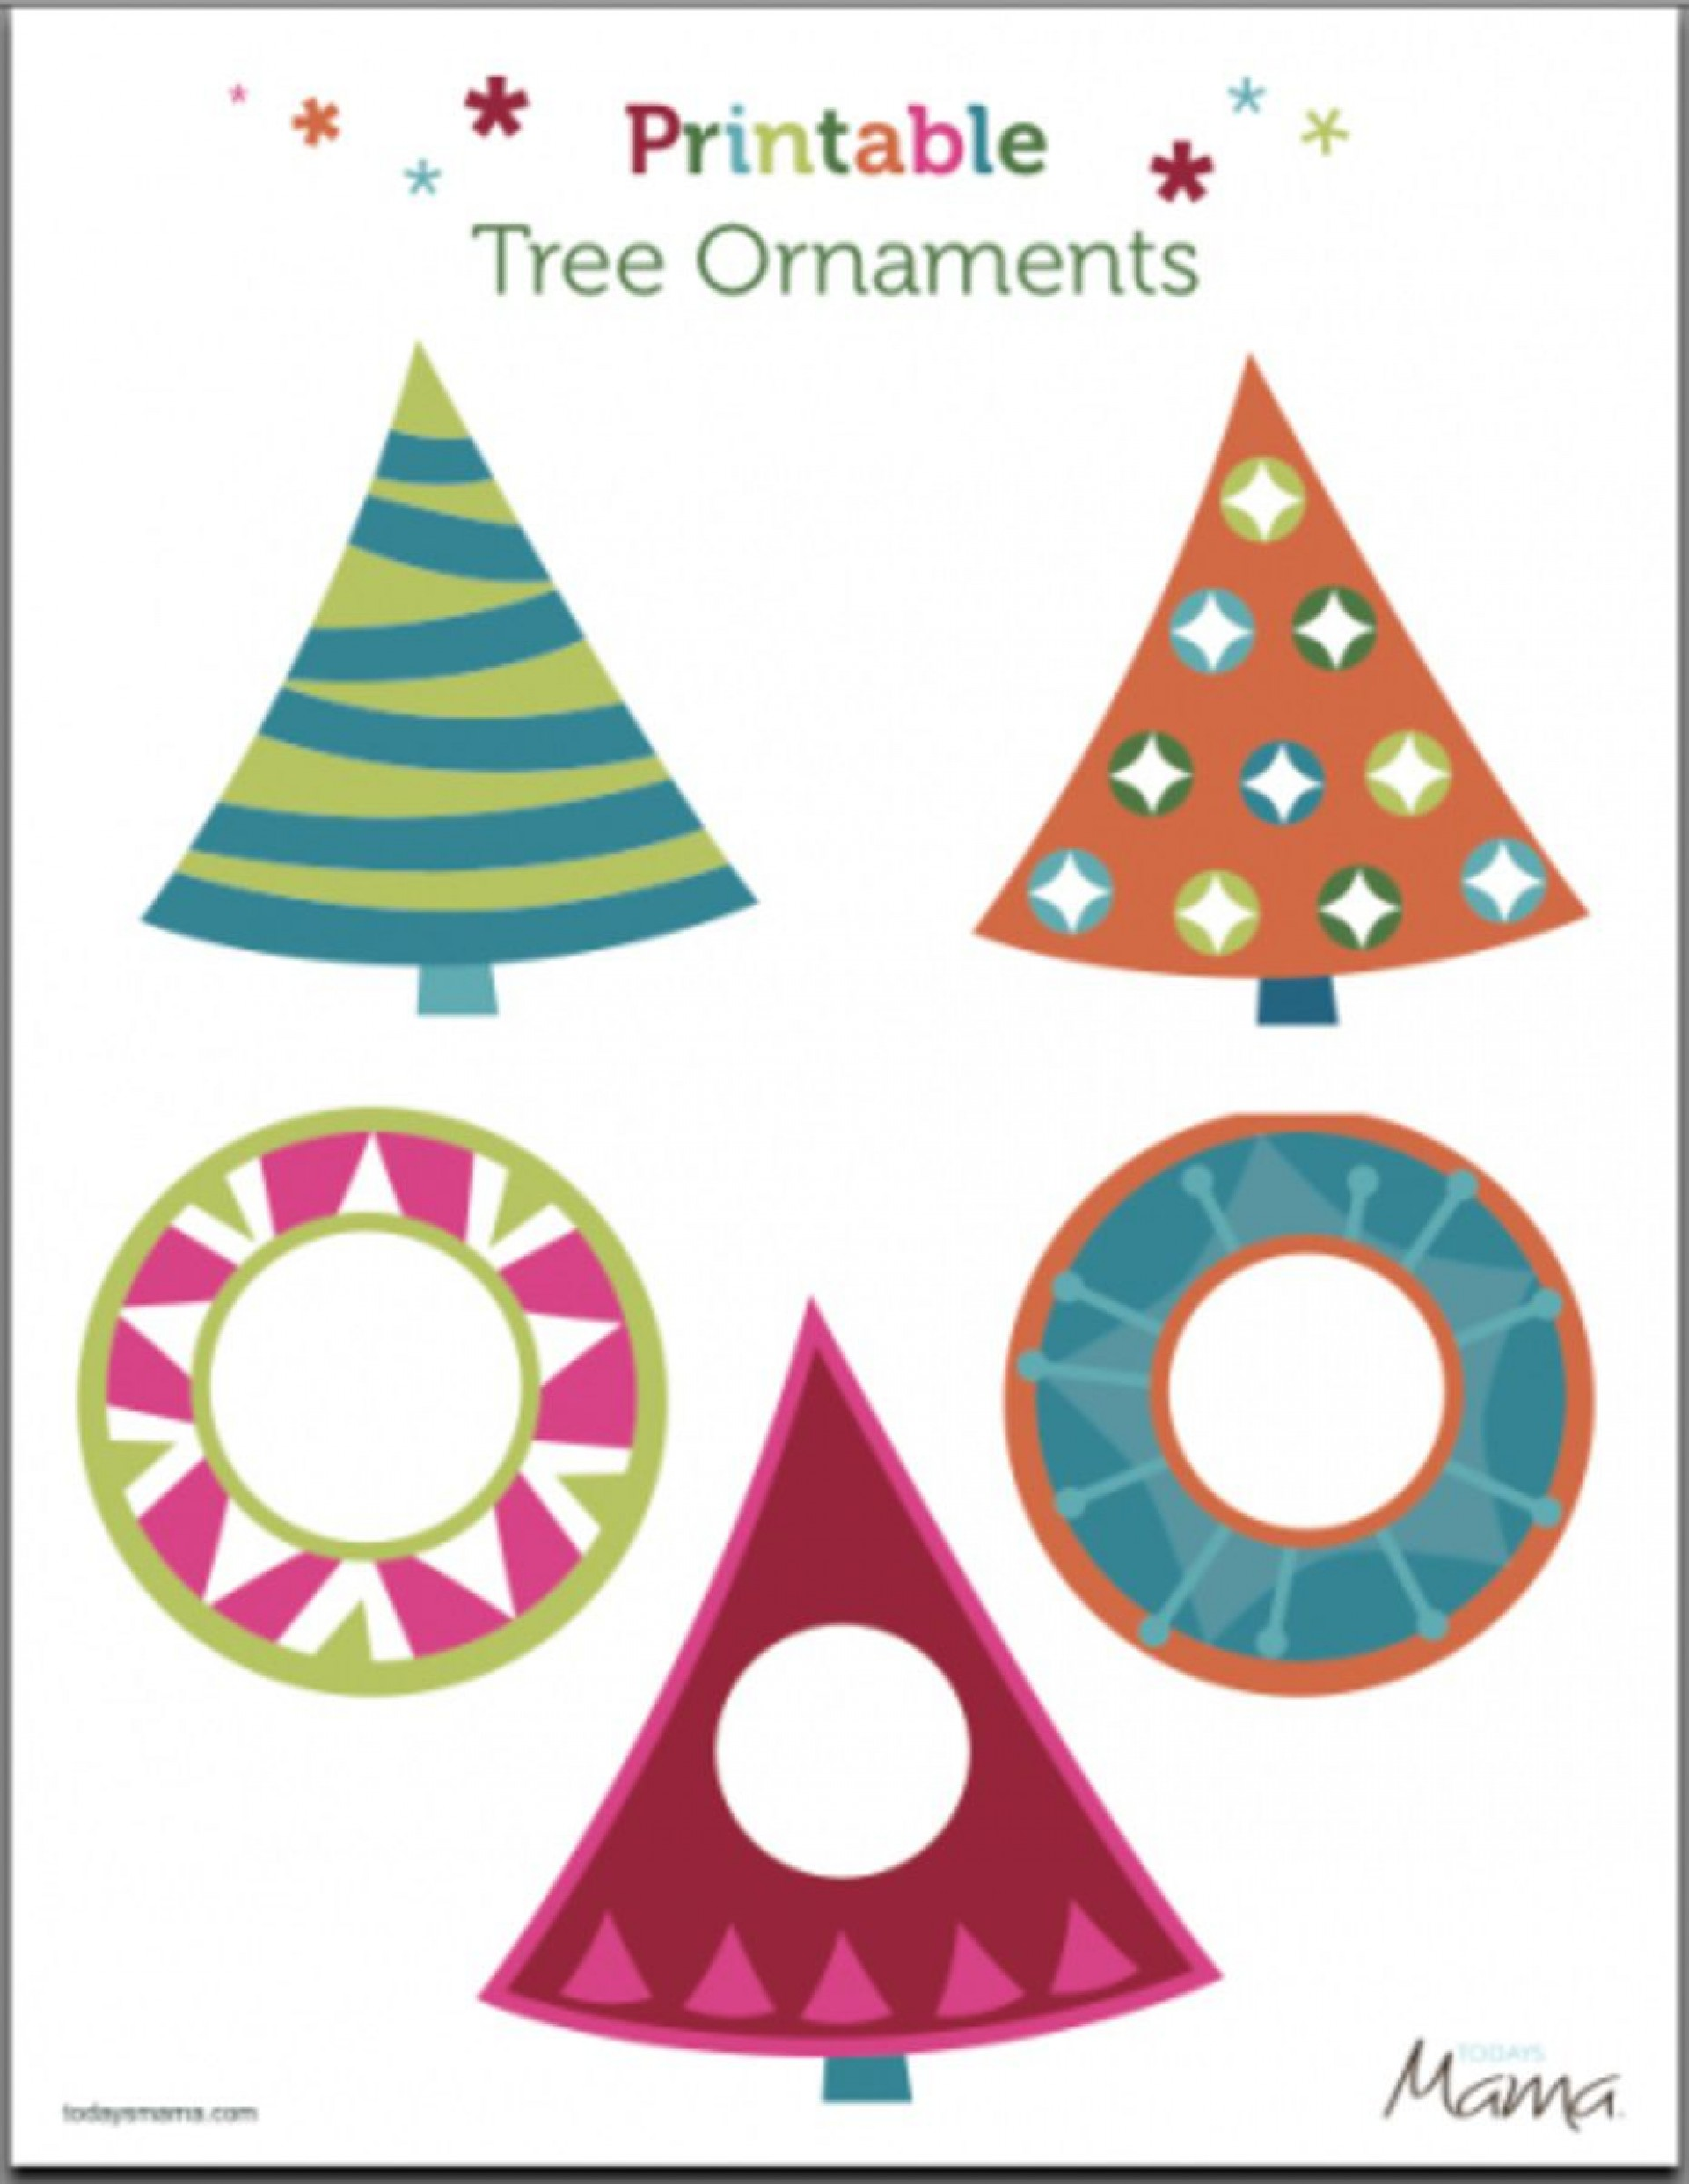 006 Rare Printable Christma Ornament Template Inspiration  Templates Stencil Felt Pattern Tree1920